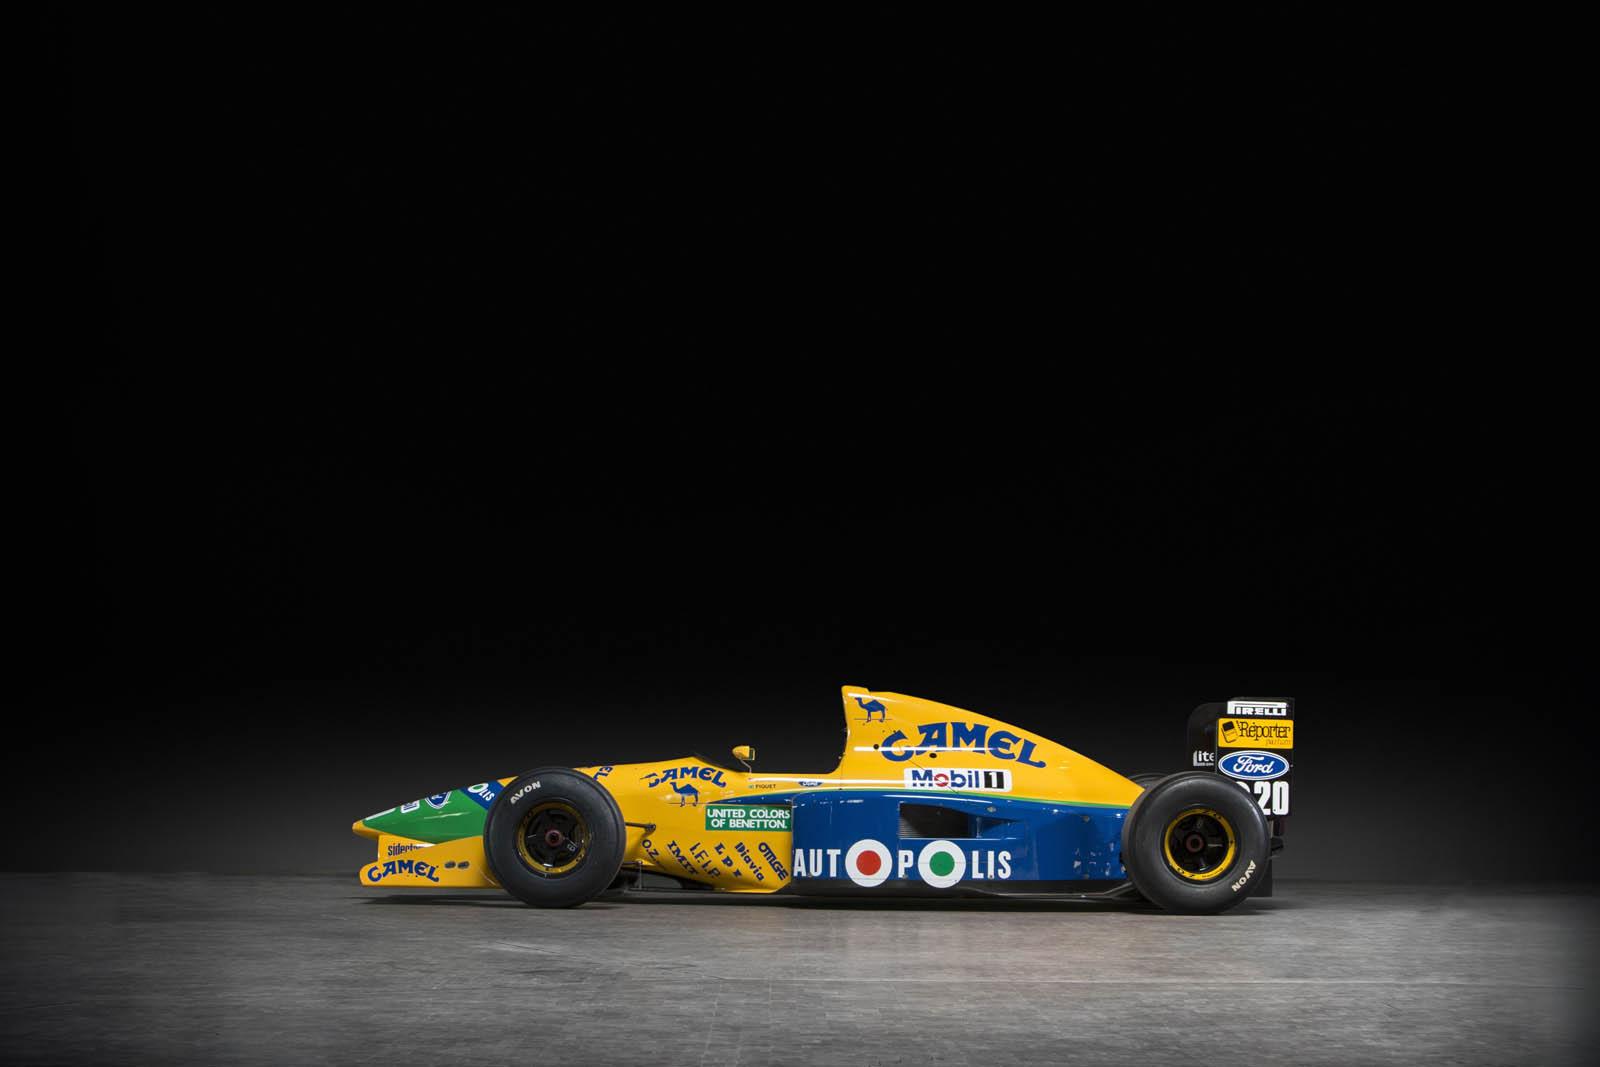 1991_Benetton-Ford_B191_10